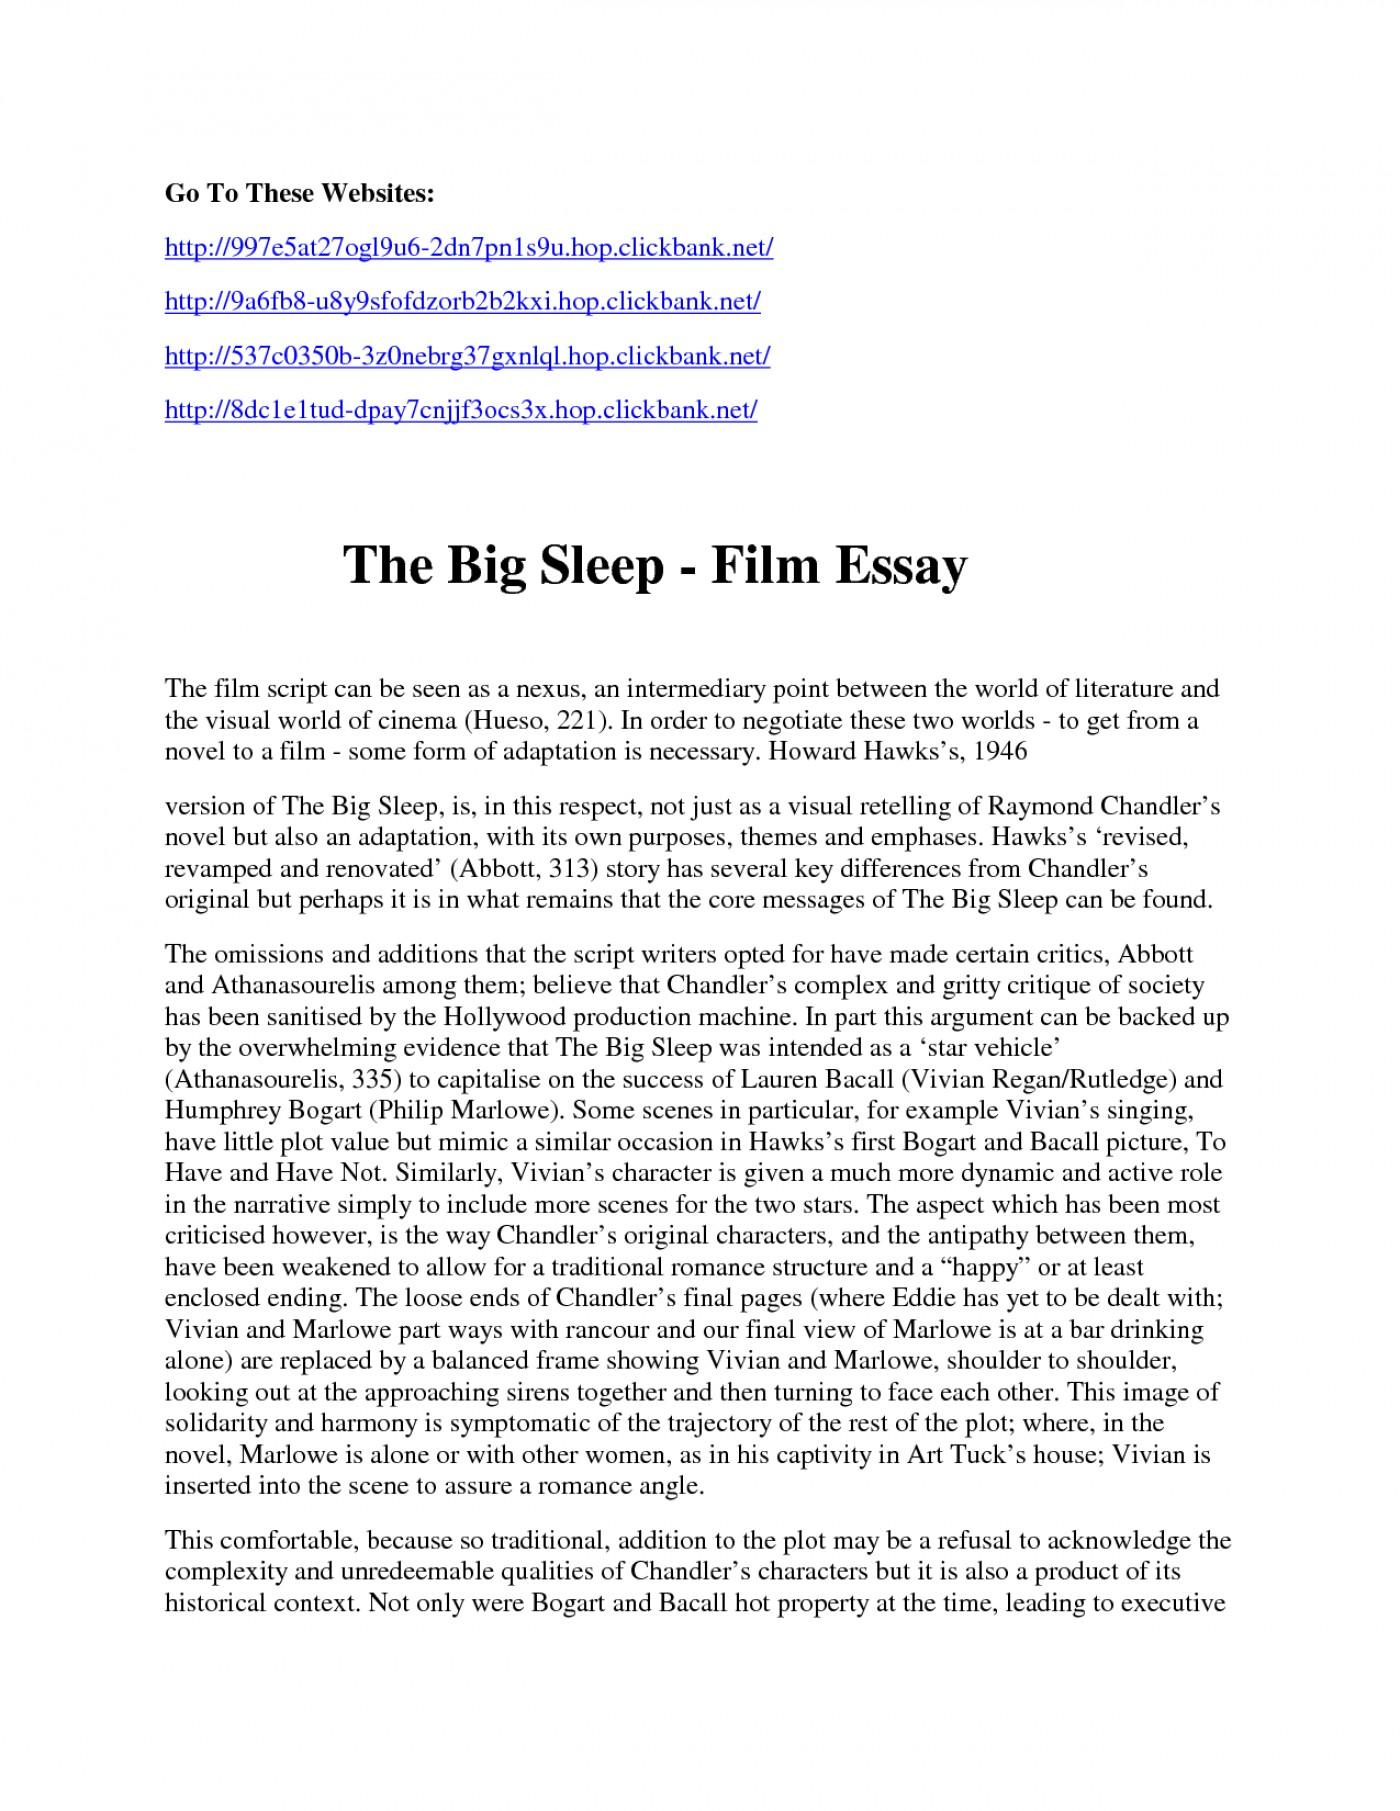 Write essay documentary